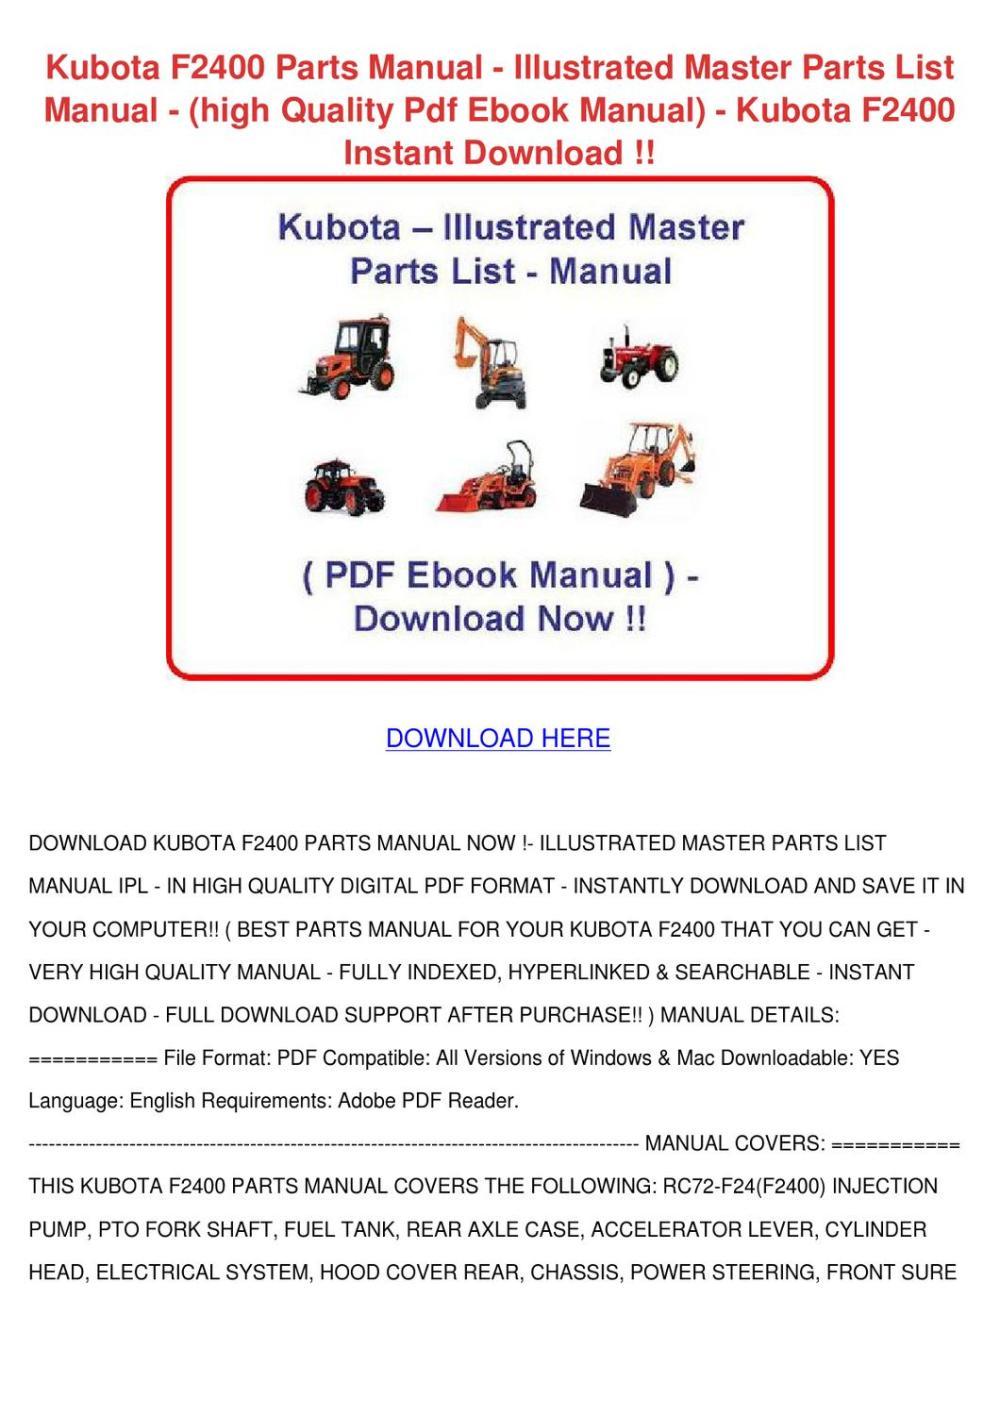 medium resolution of kubota f2400 parts manual illustrated master